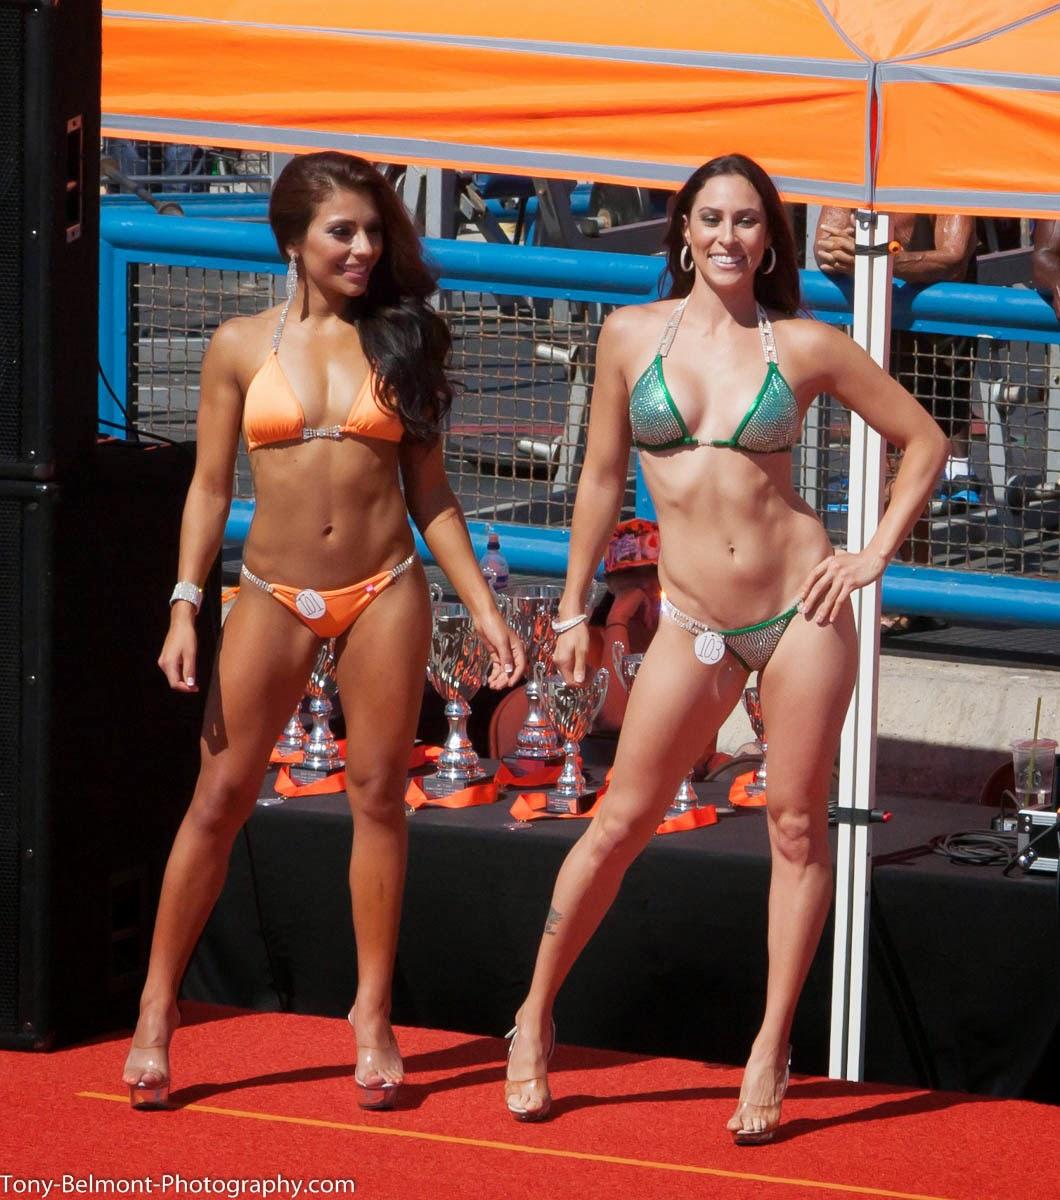 Pic free Bikini contest